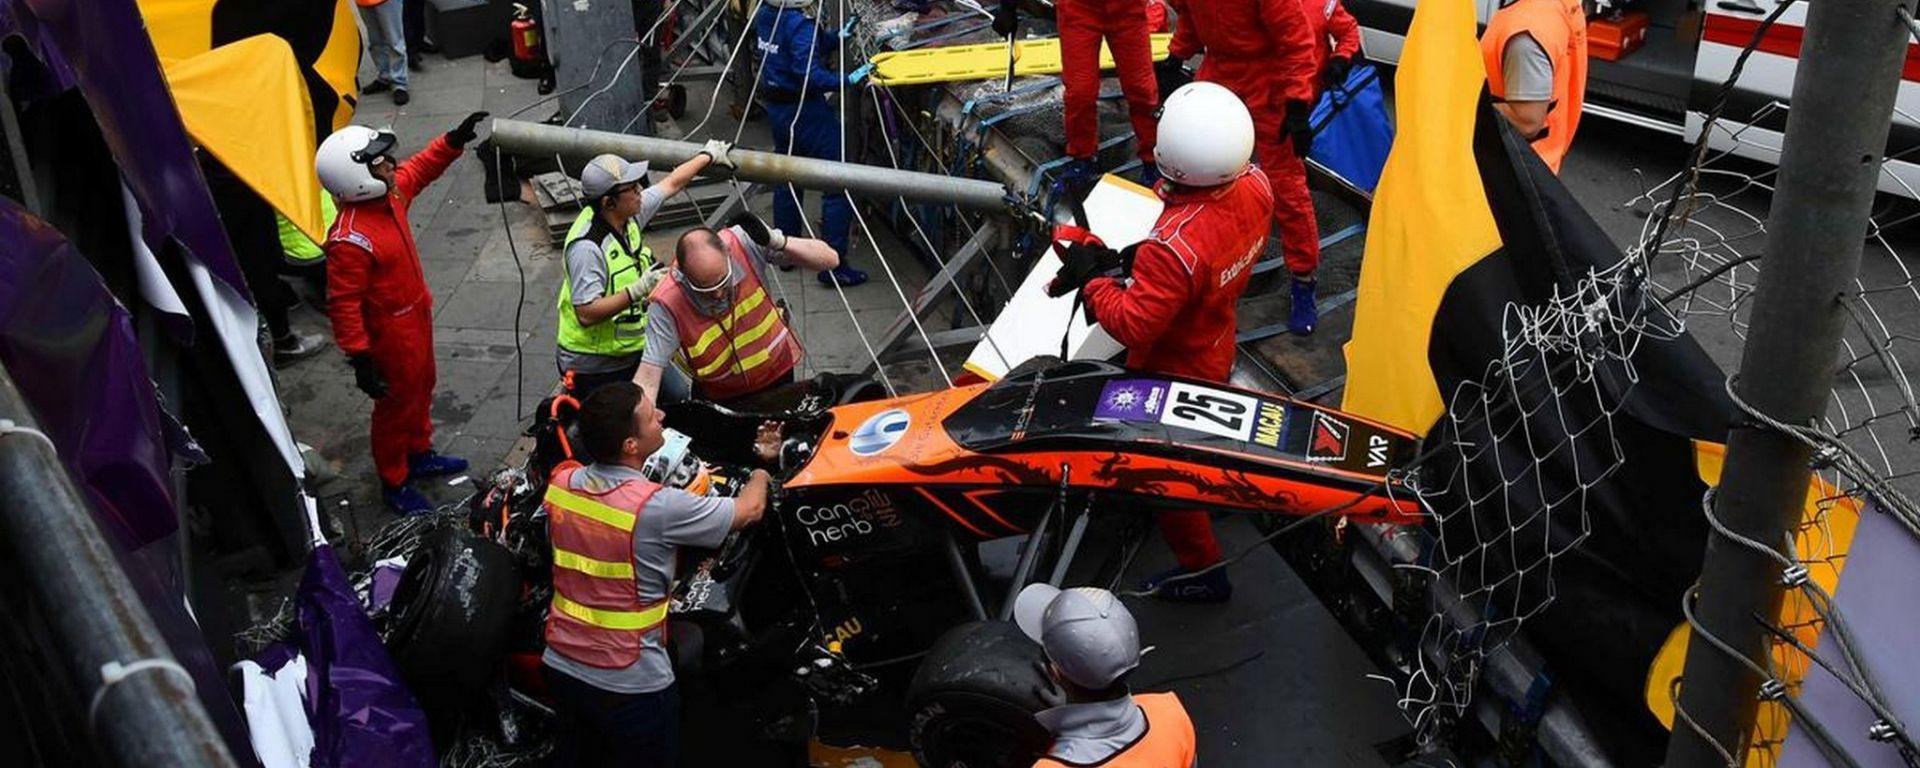 GP Macao, incidente per Sophia Floersch. Le ultime news